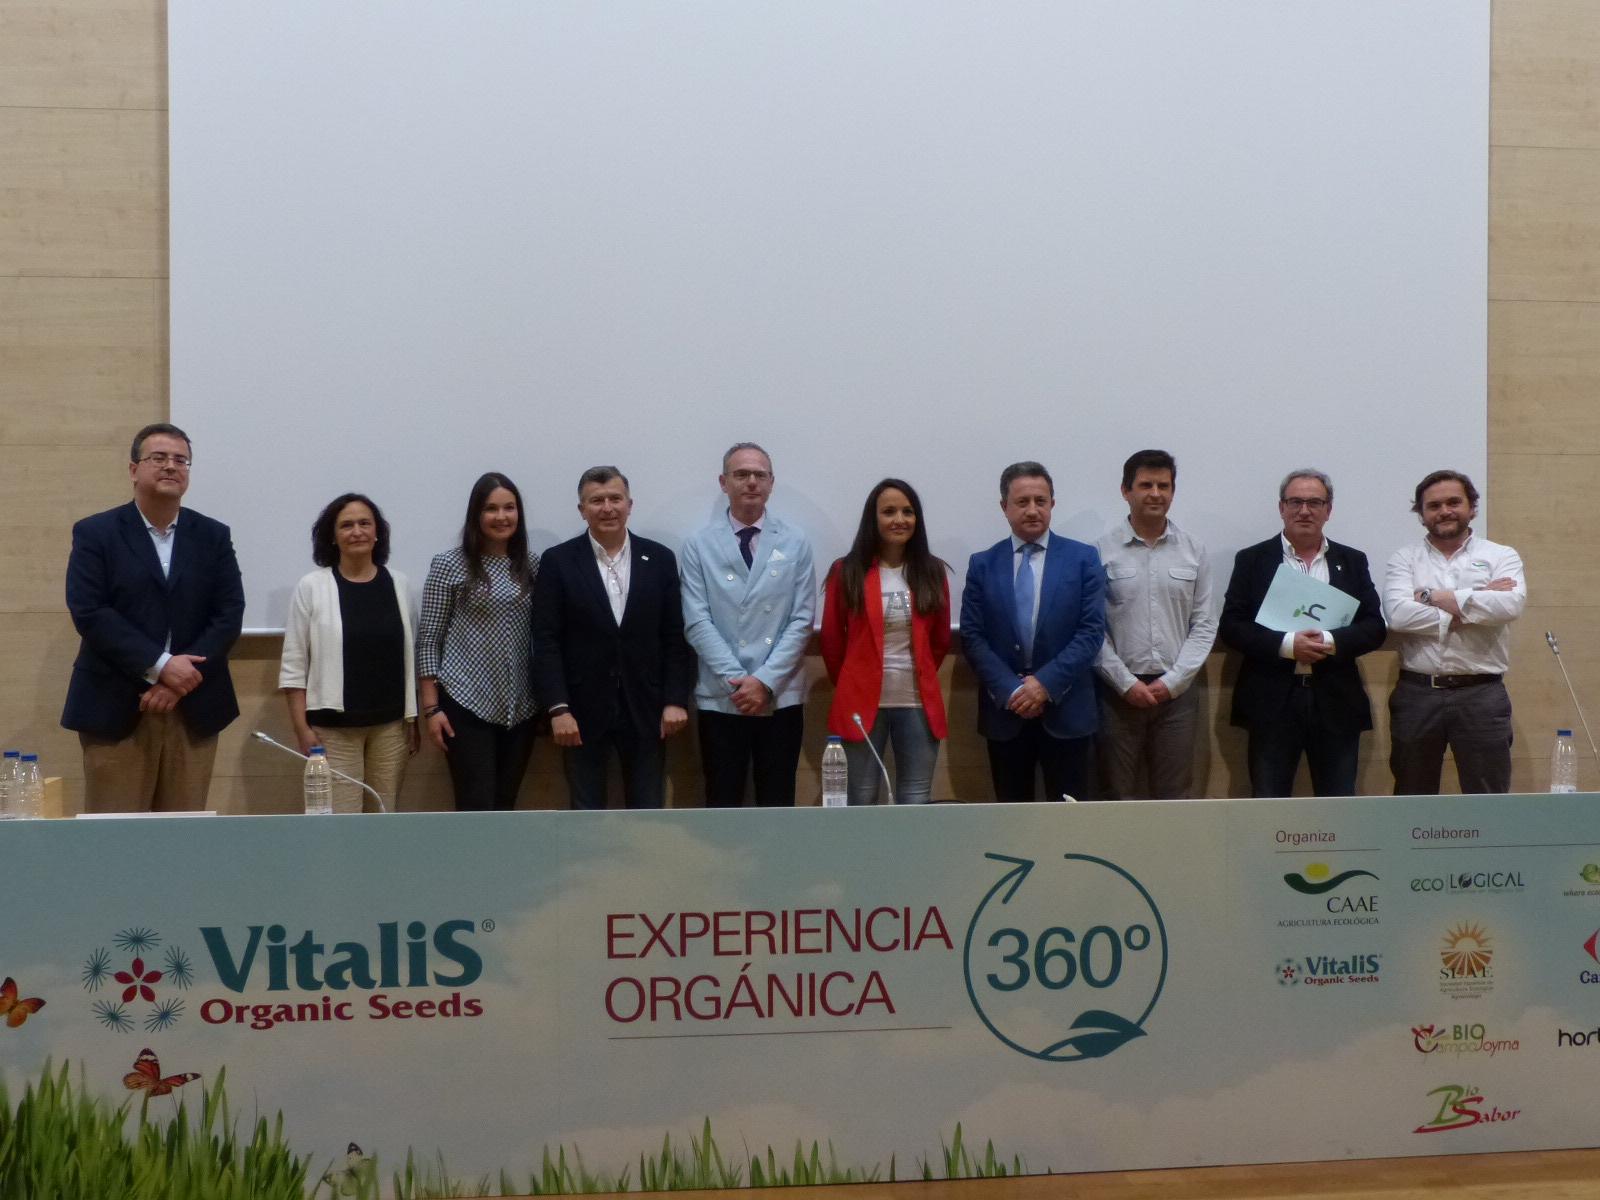 vitalis jornada experiencia organica 360